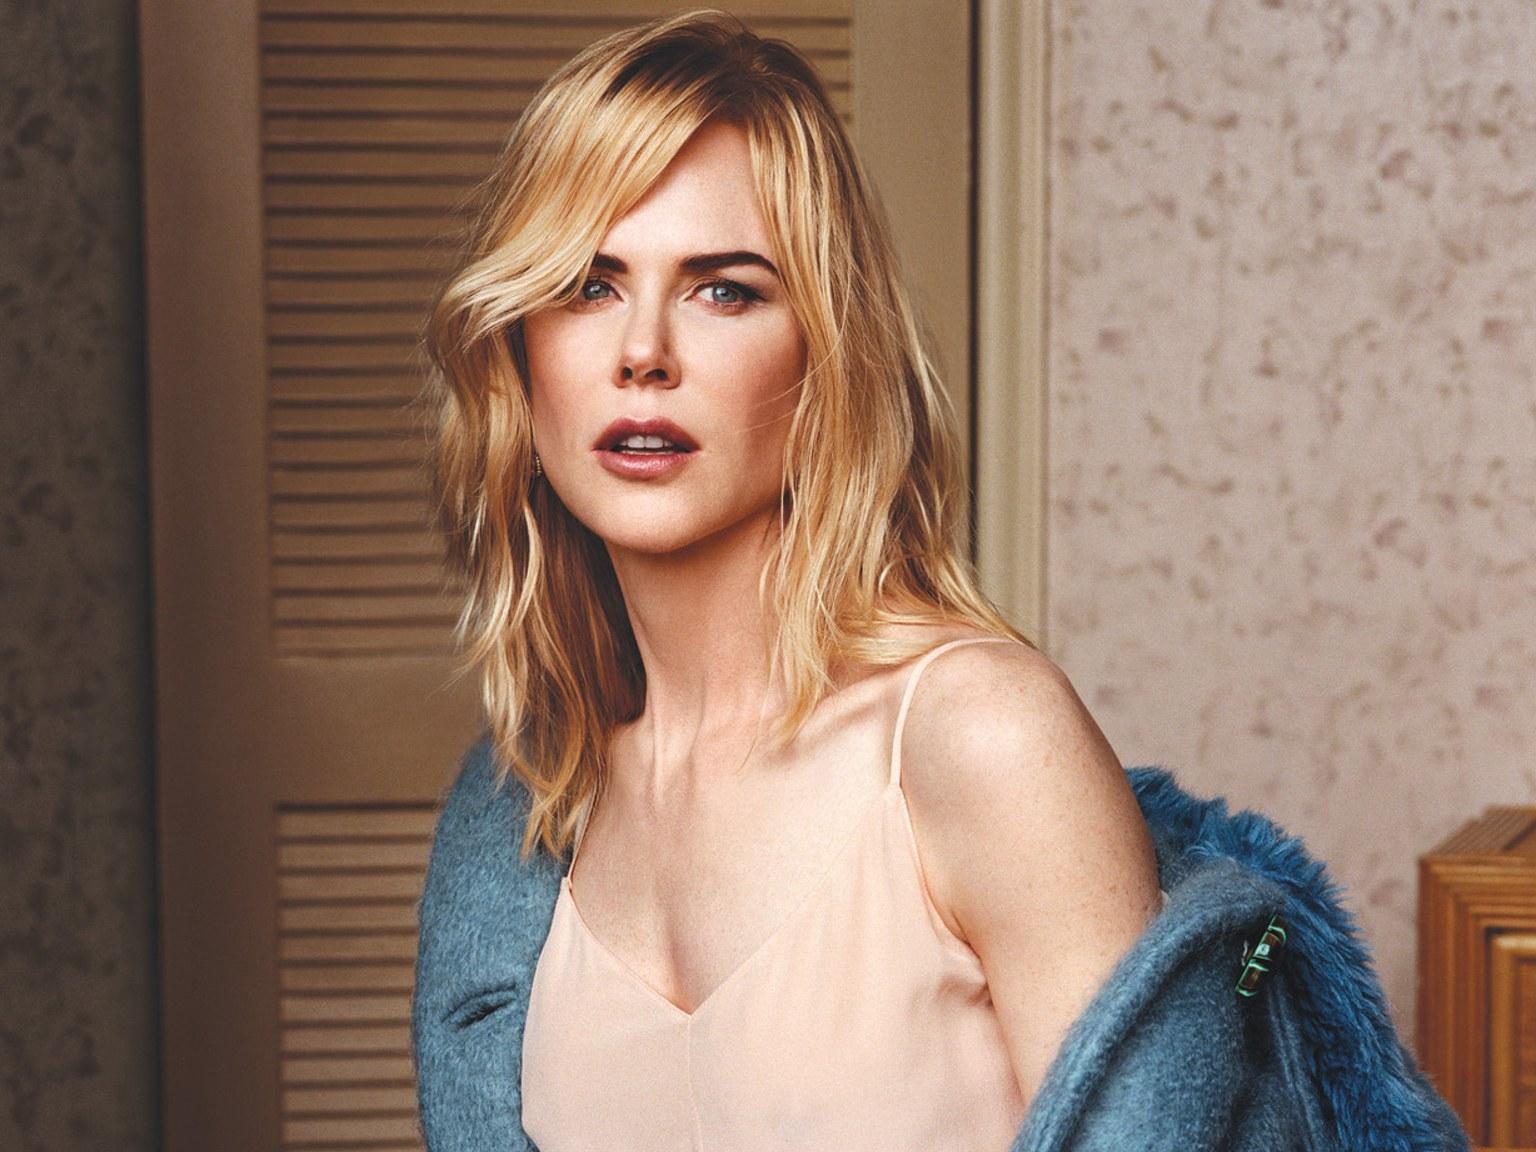 Nicole Kidman: Αυτός είναι ο νέος ρόλος της ηθοποιού που θα συζητηθεί | tlife.gr